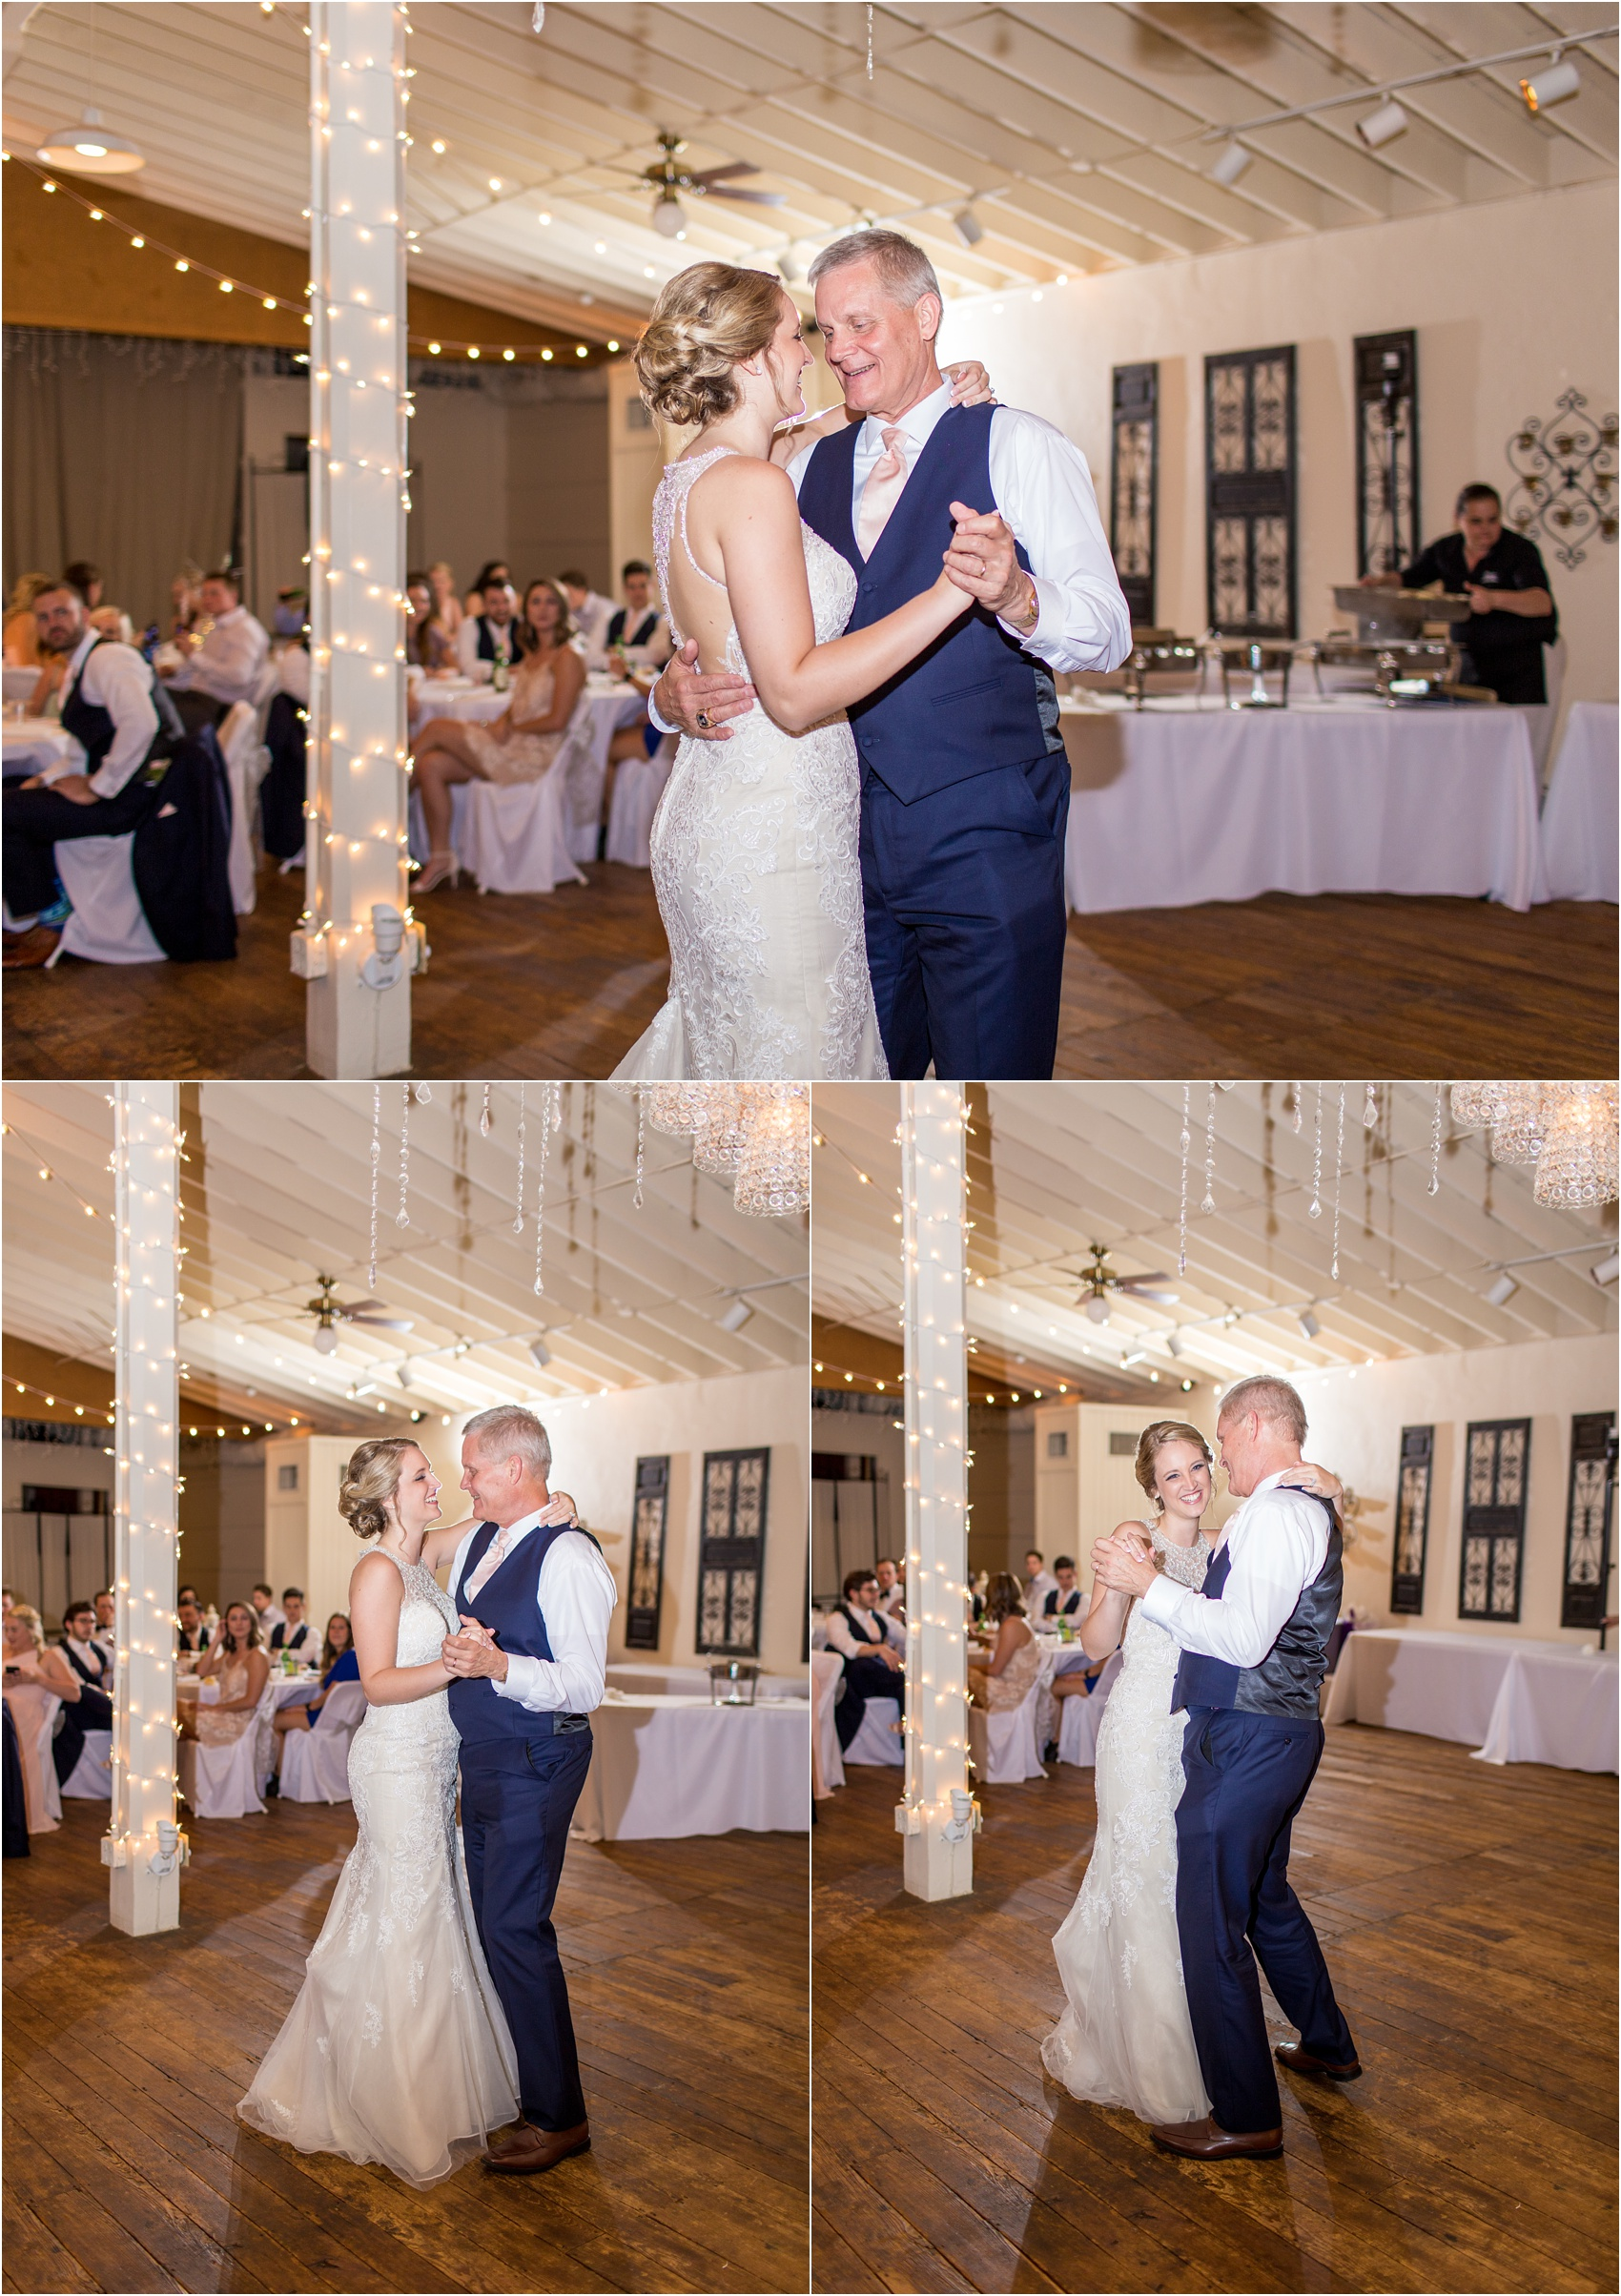 Savannah Eve Photography- Roper-Powell Wedding- Blog-62.jpg